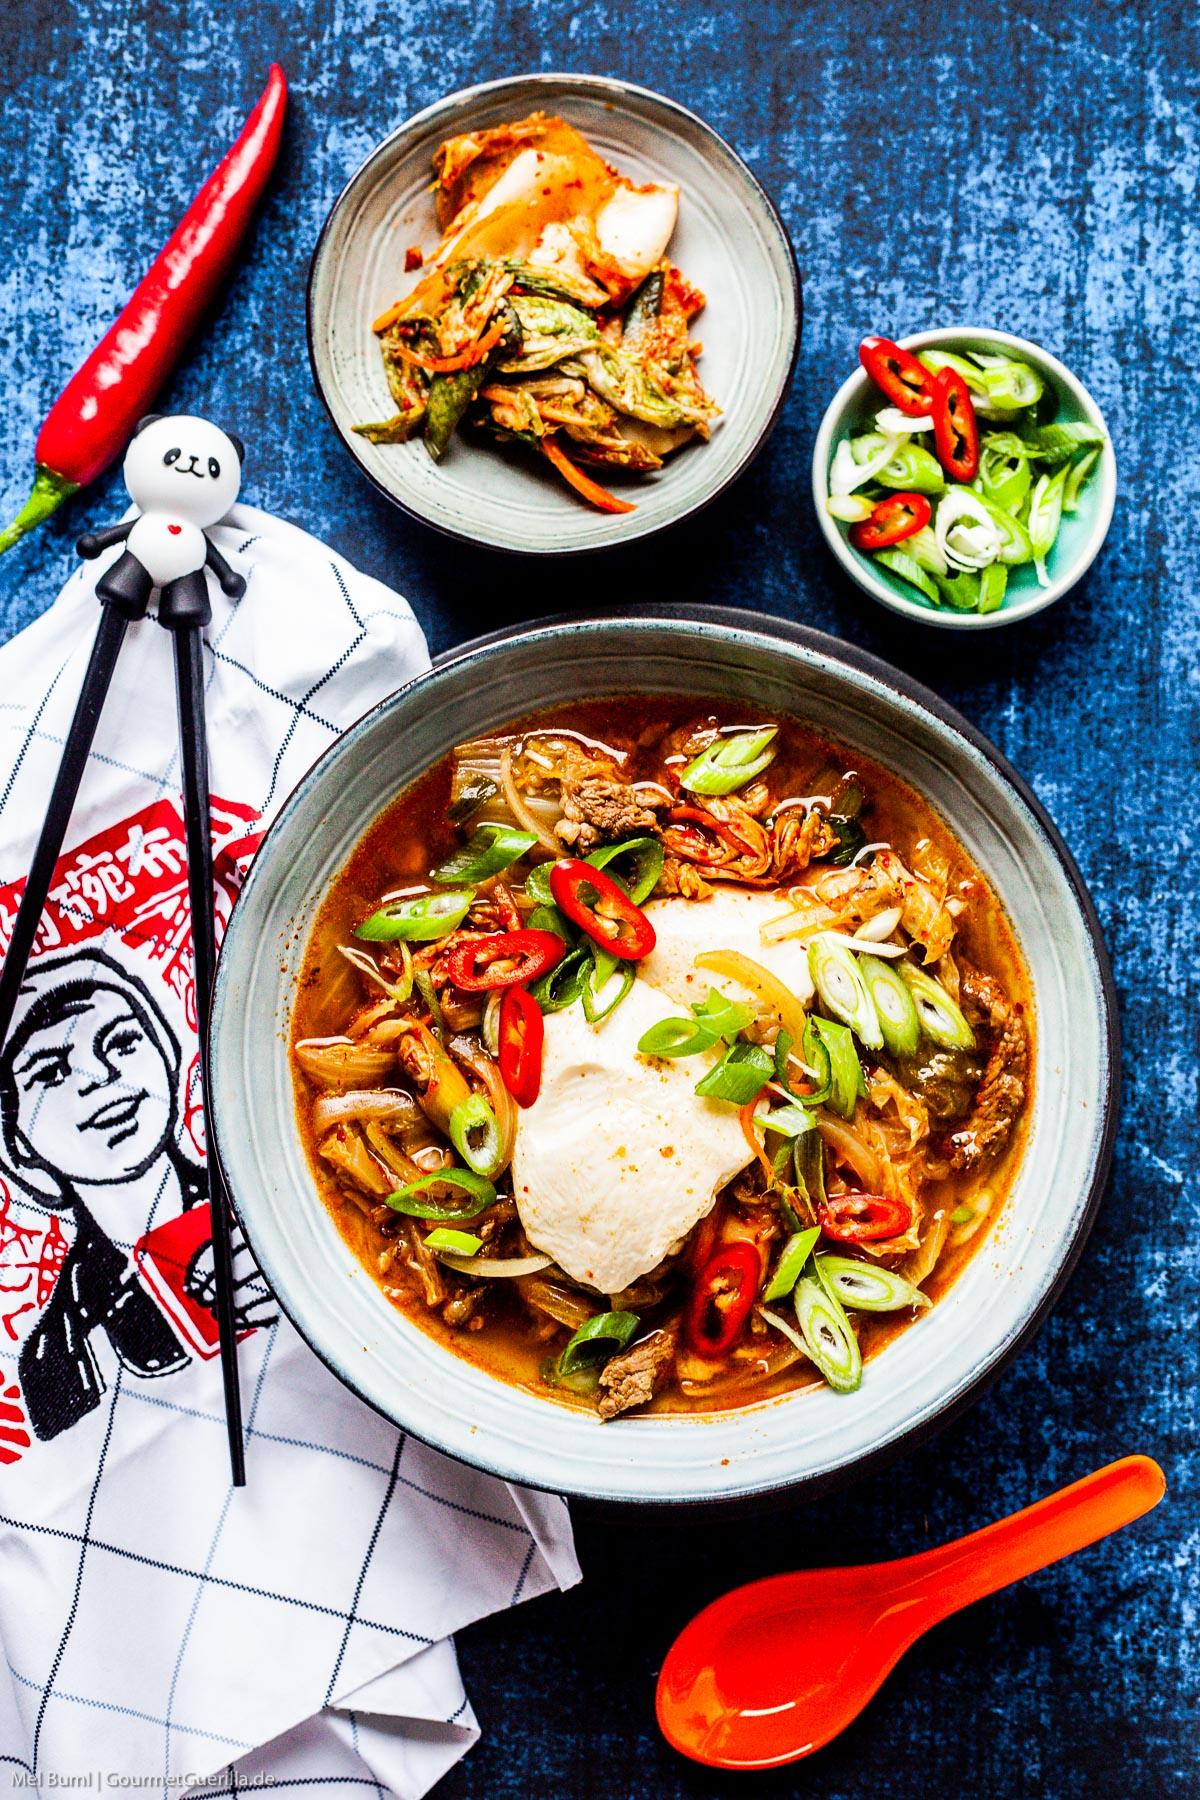 Schneller Koreanischer Tofu-Eintopf mit Kimchi Sundubu JJigae  GourmetGuerilla.de